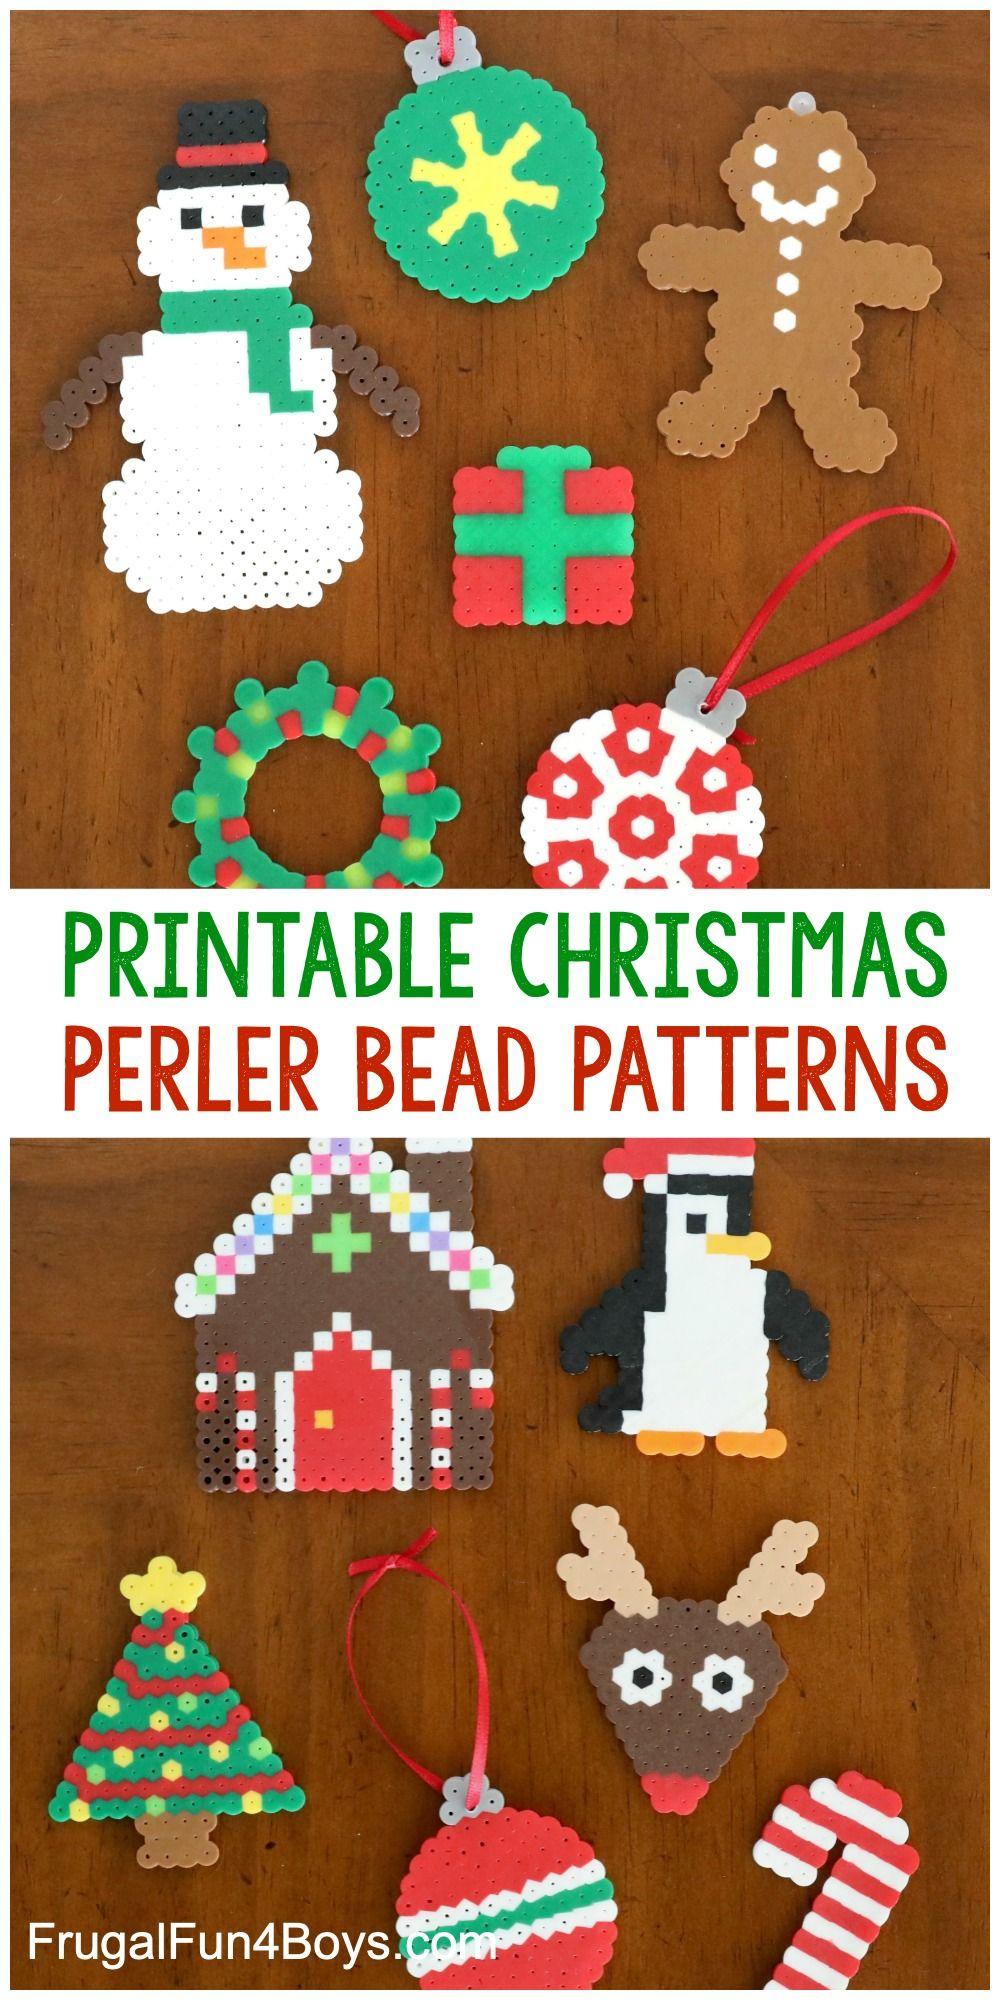 Printable Christmas Perler Bead Patterns Frugal Fun For Boys And Girls Christmas Perler Beads Easy Perler Bead Patterns Perler Bead Templates